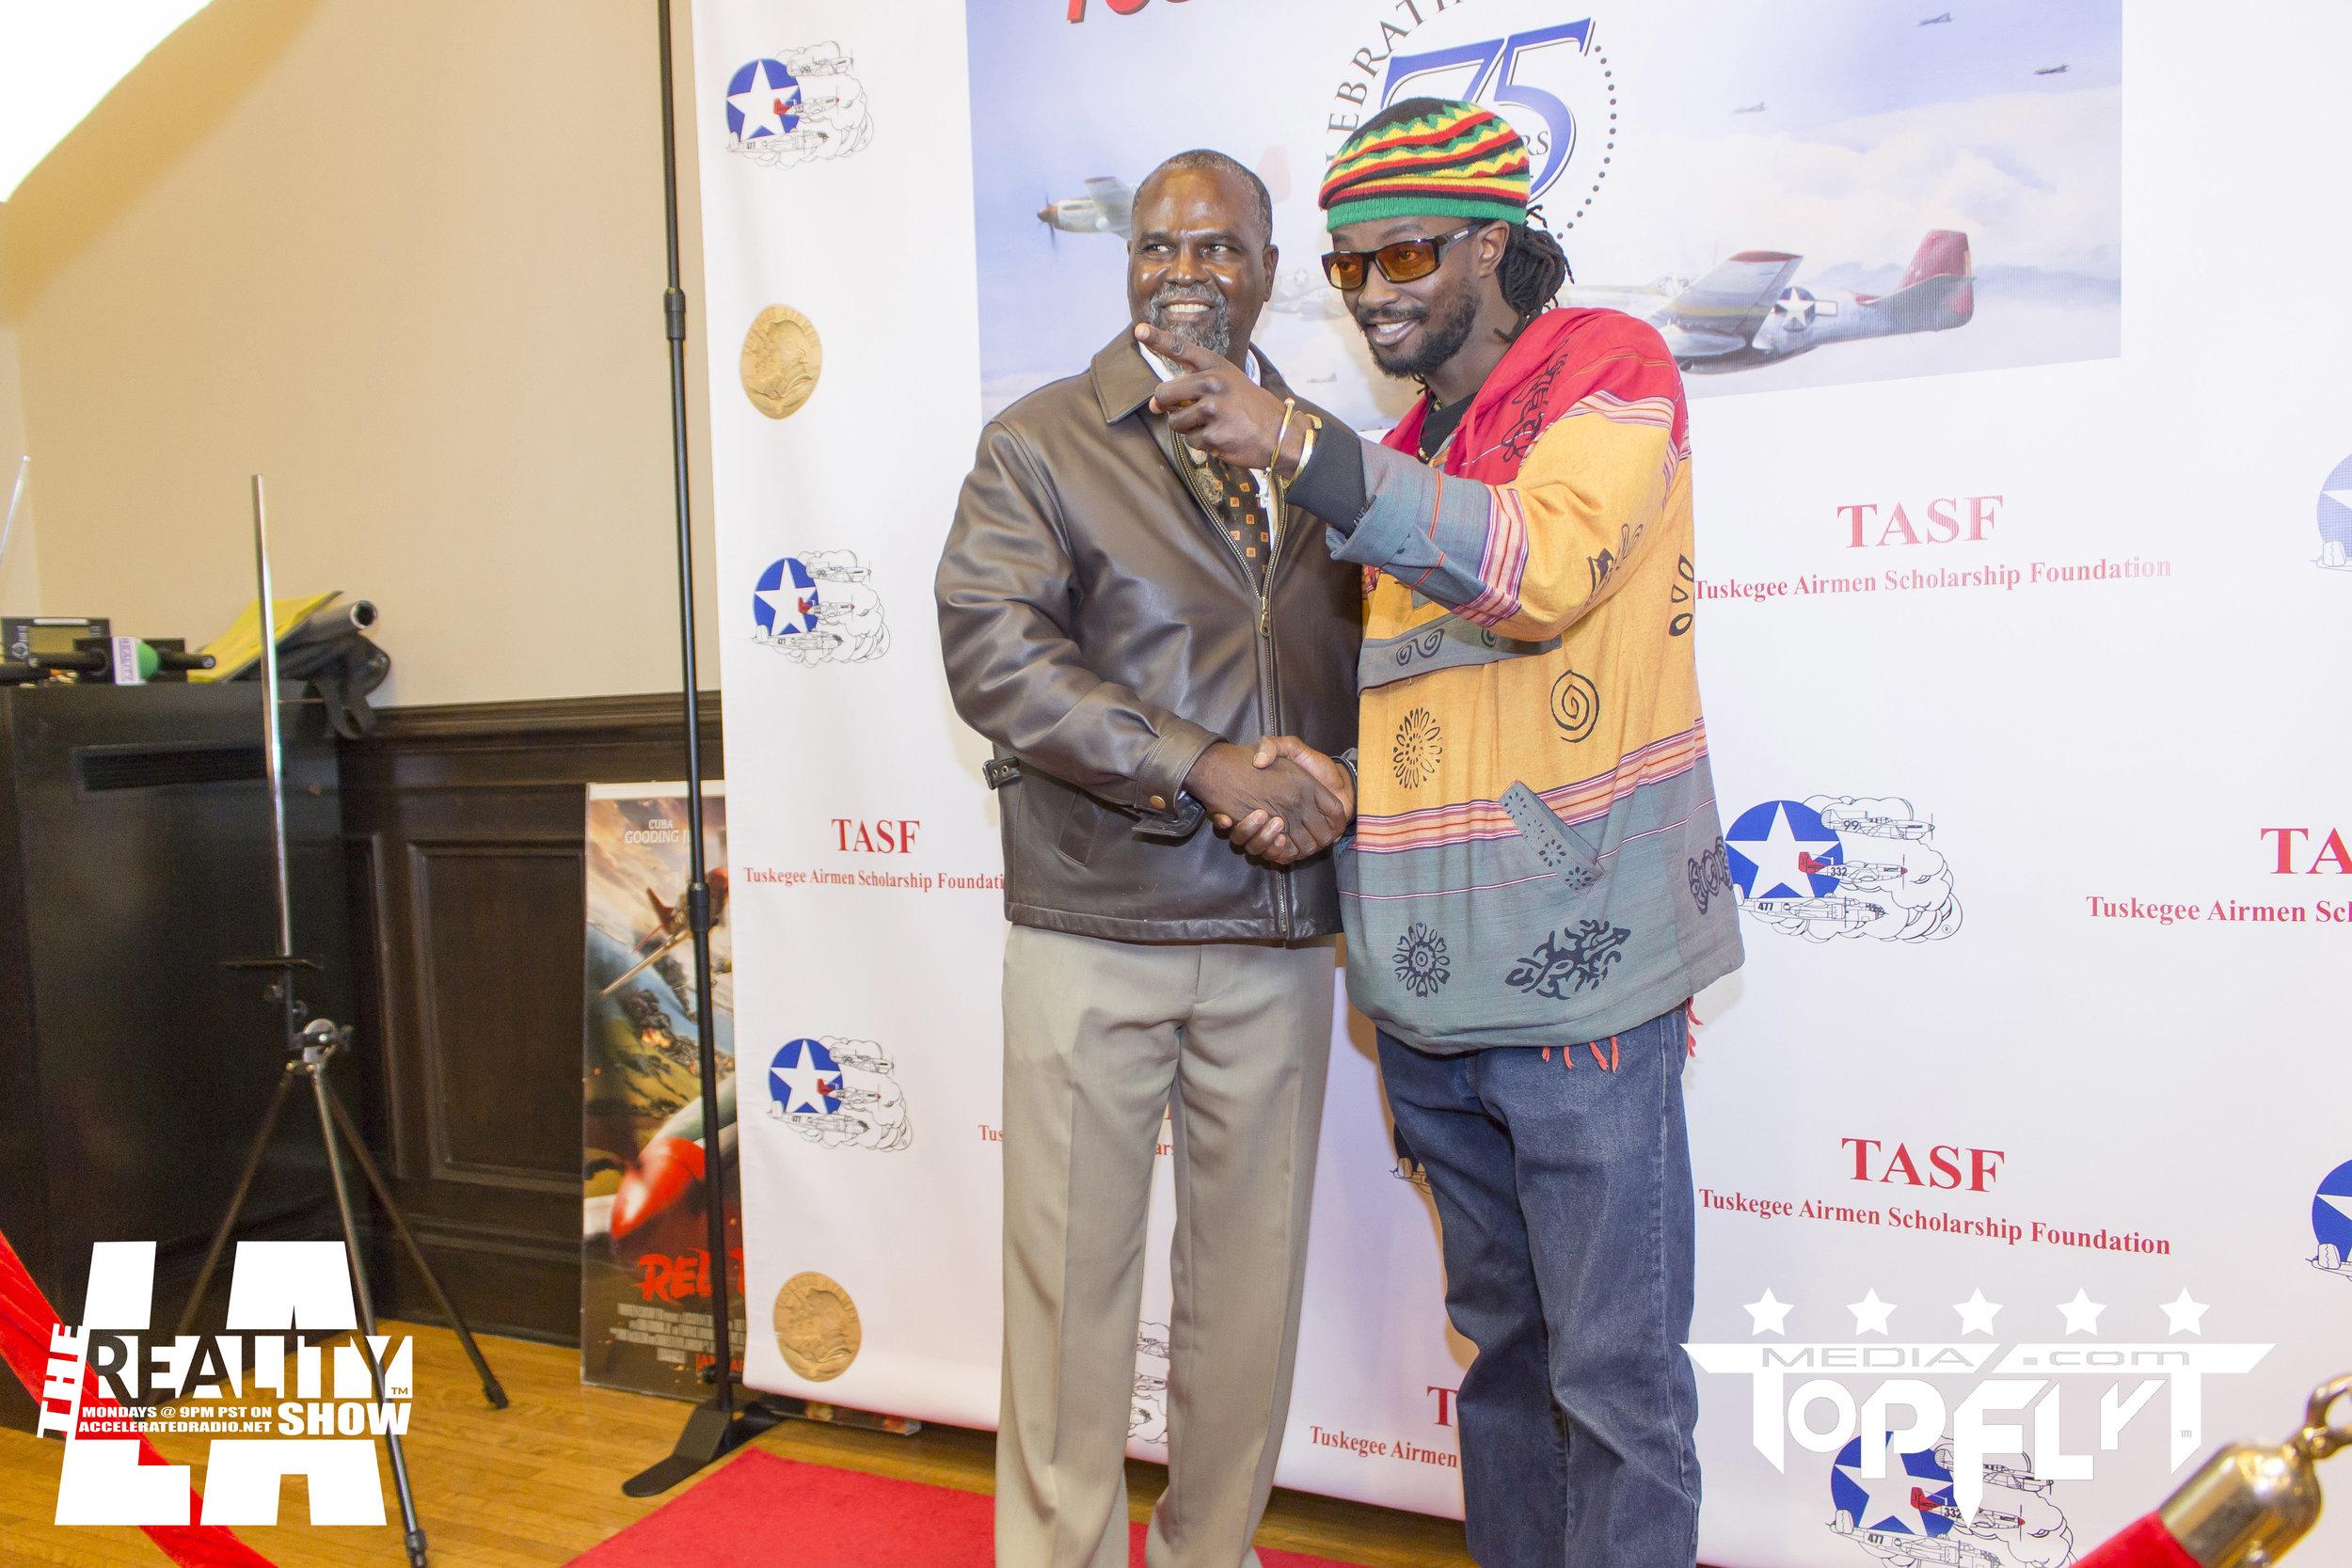 The Reality Show LA - Tuskegee Airmen 75th Anniversary VIP Reception_122.jpg